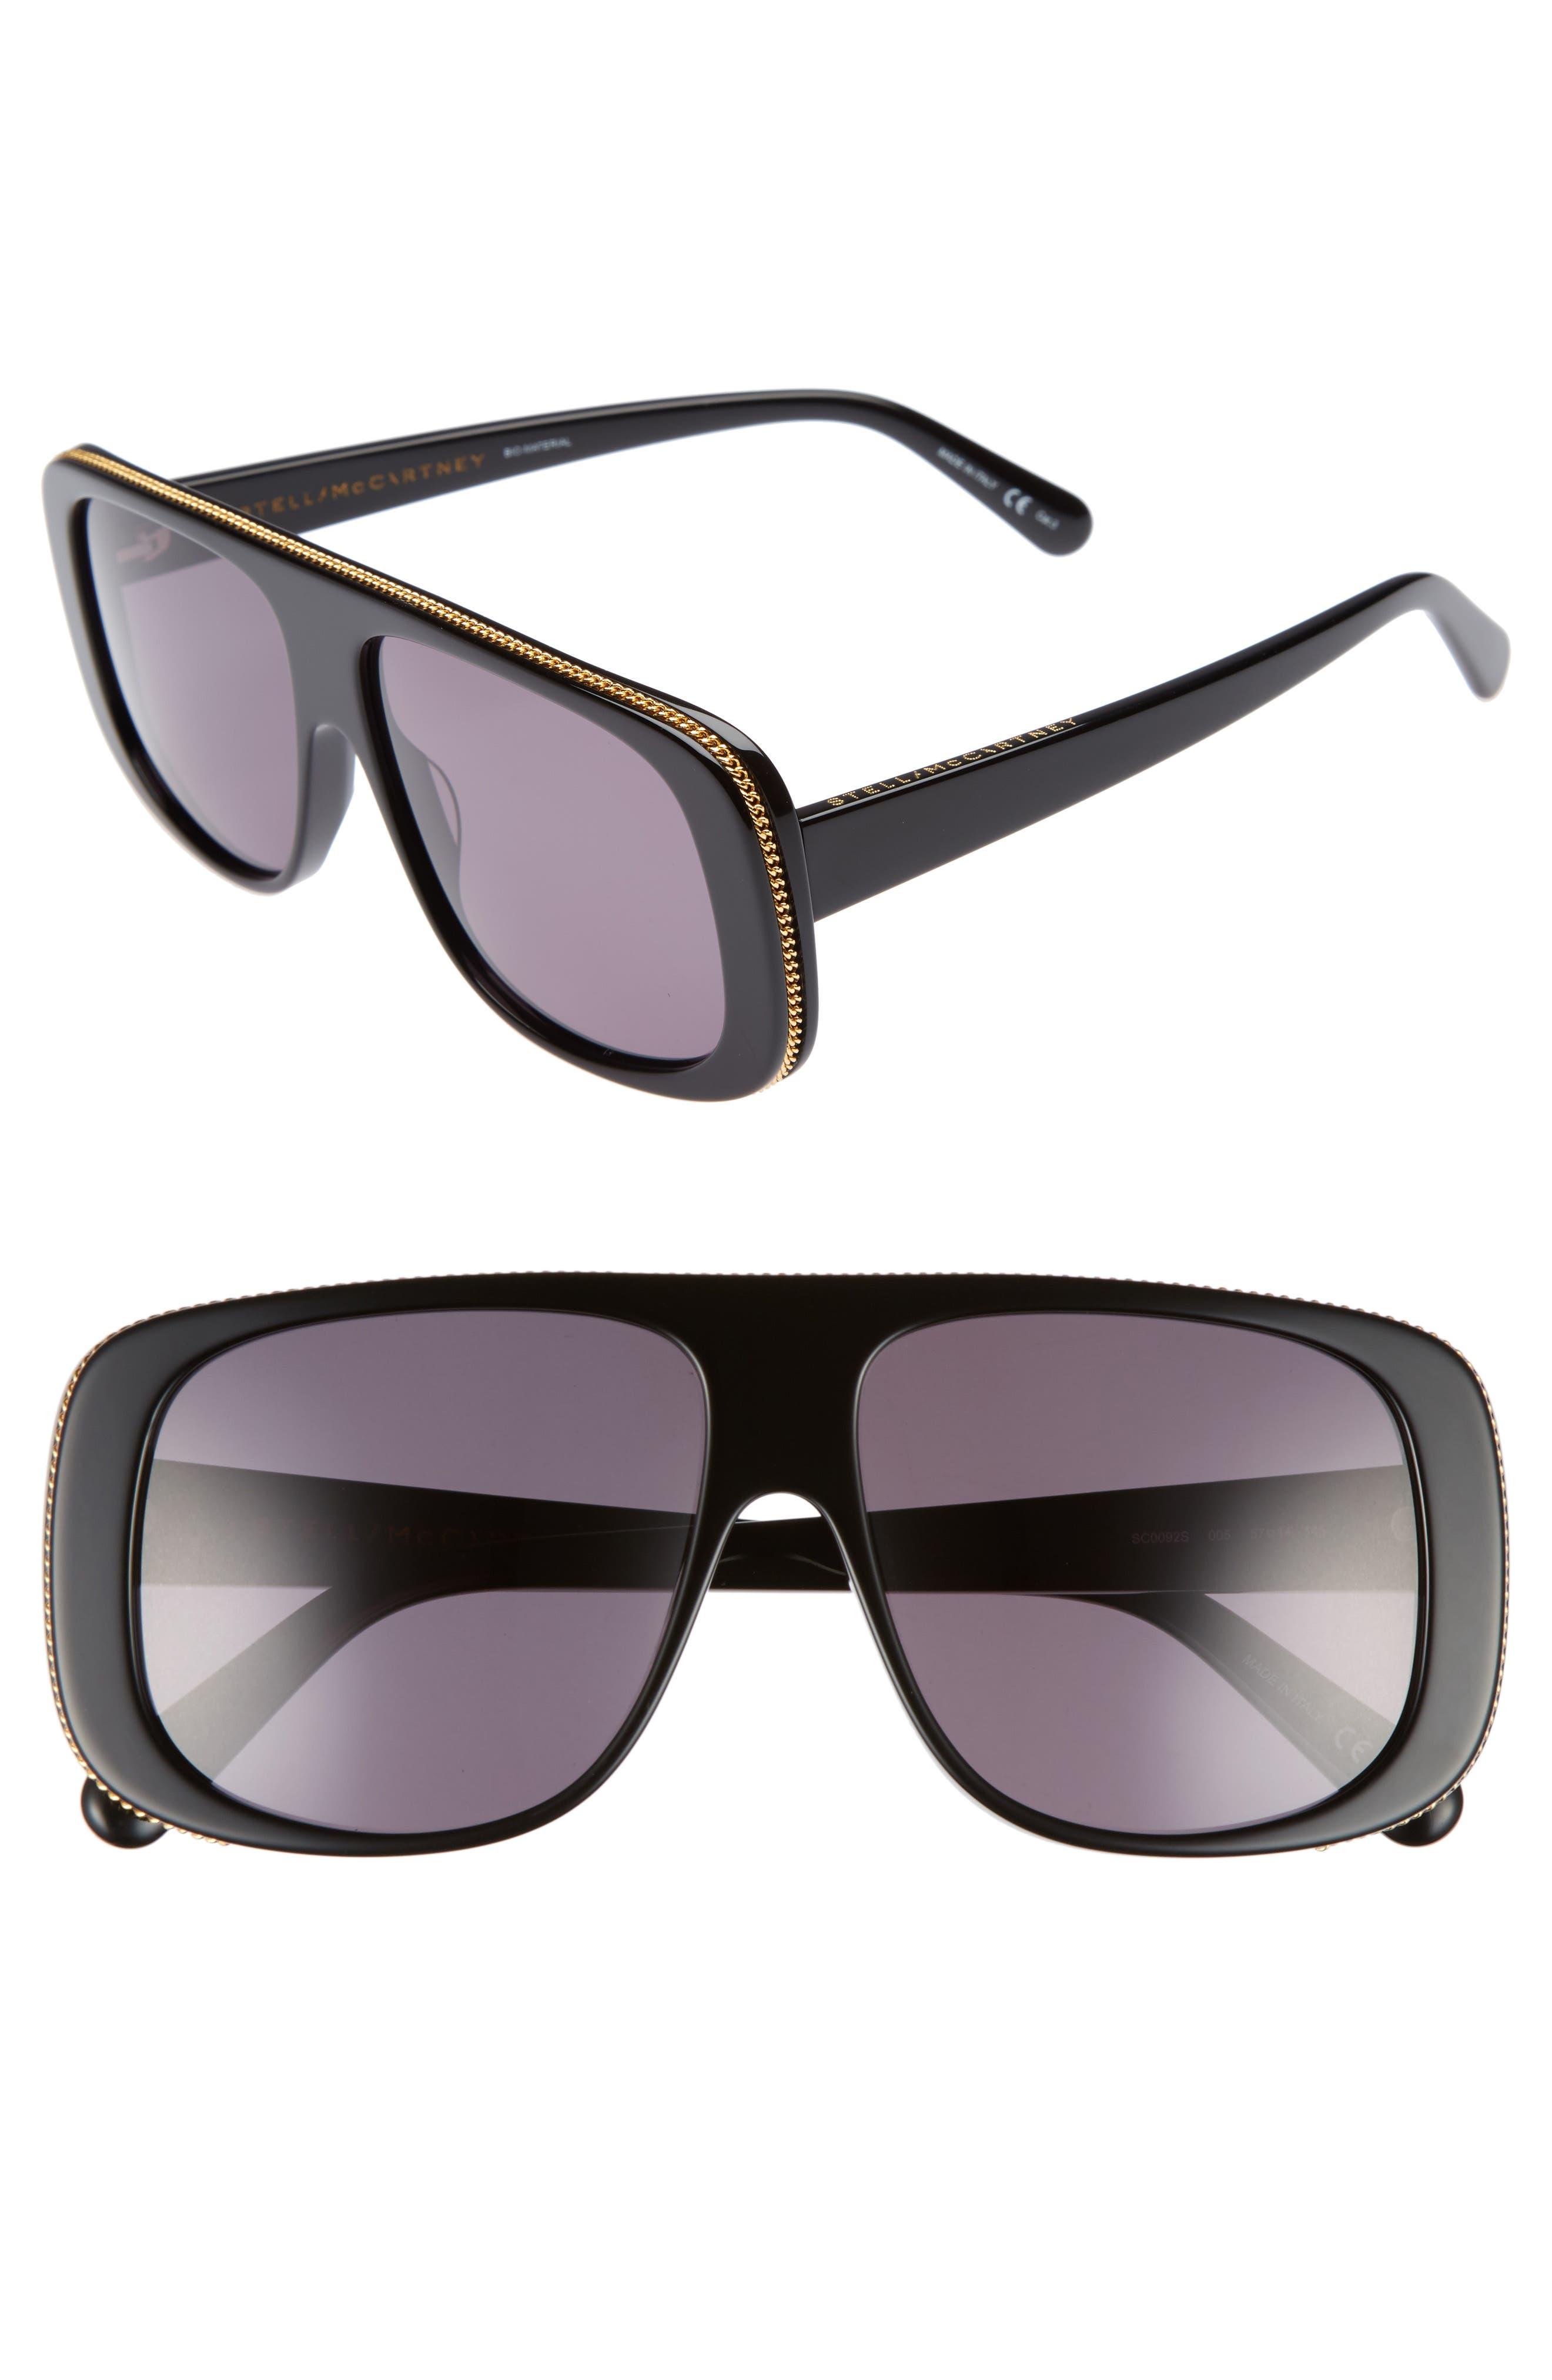 57mm Flat Top Sunglasses,                         Main,                         color, BLACK/ GREY